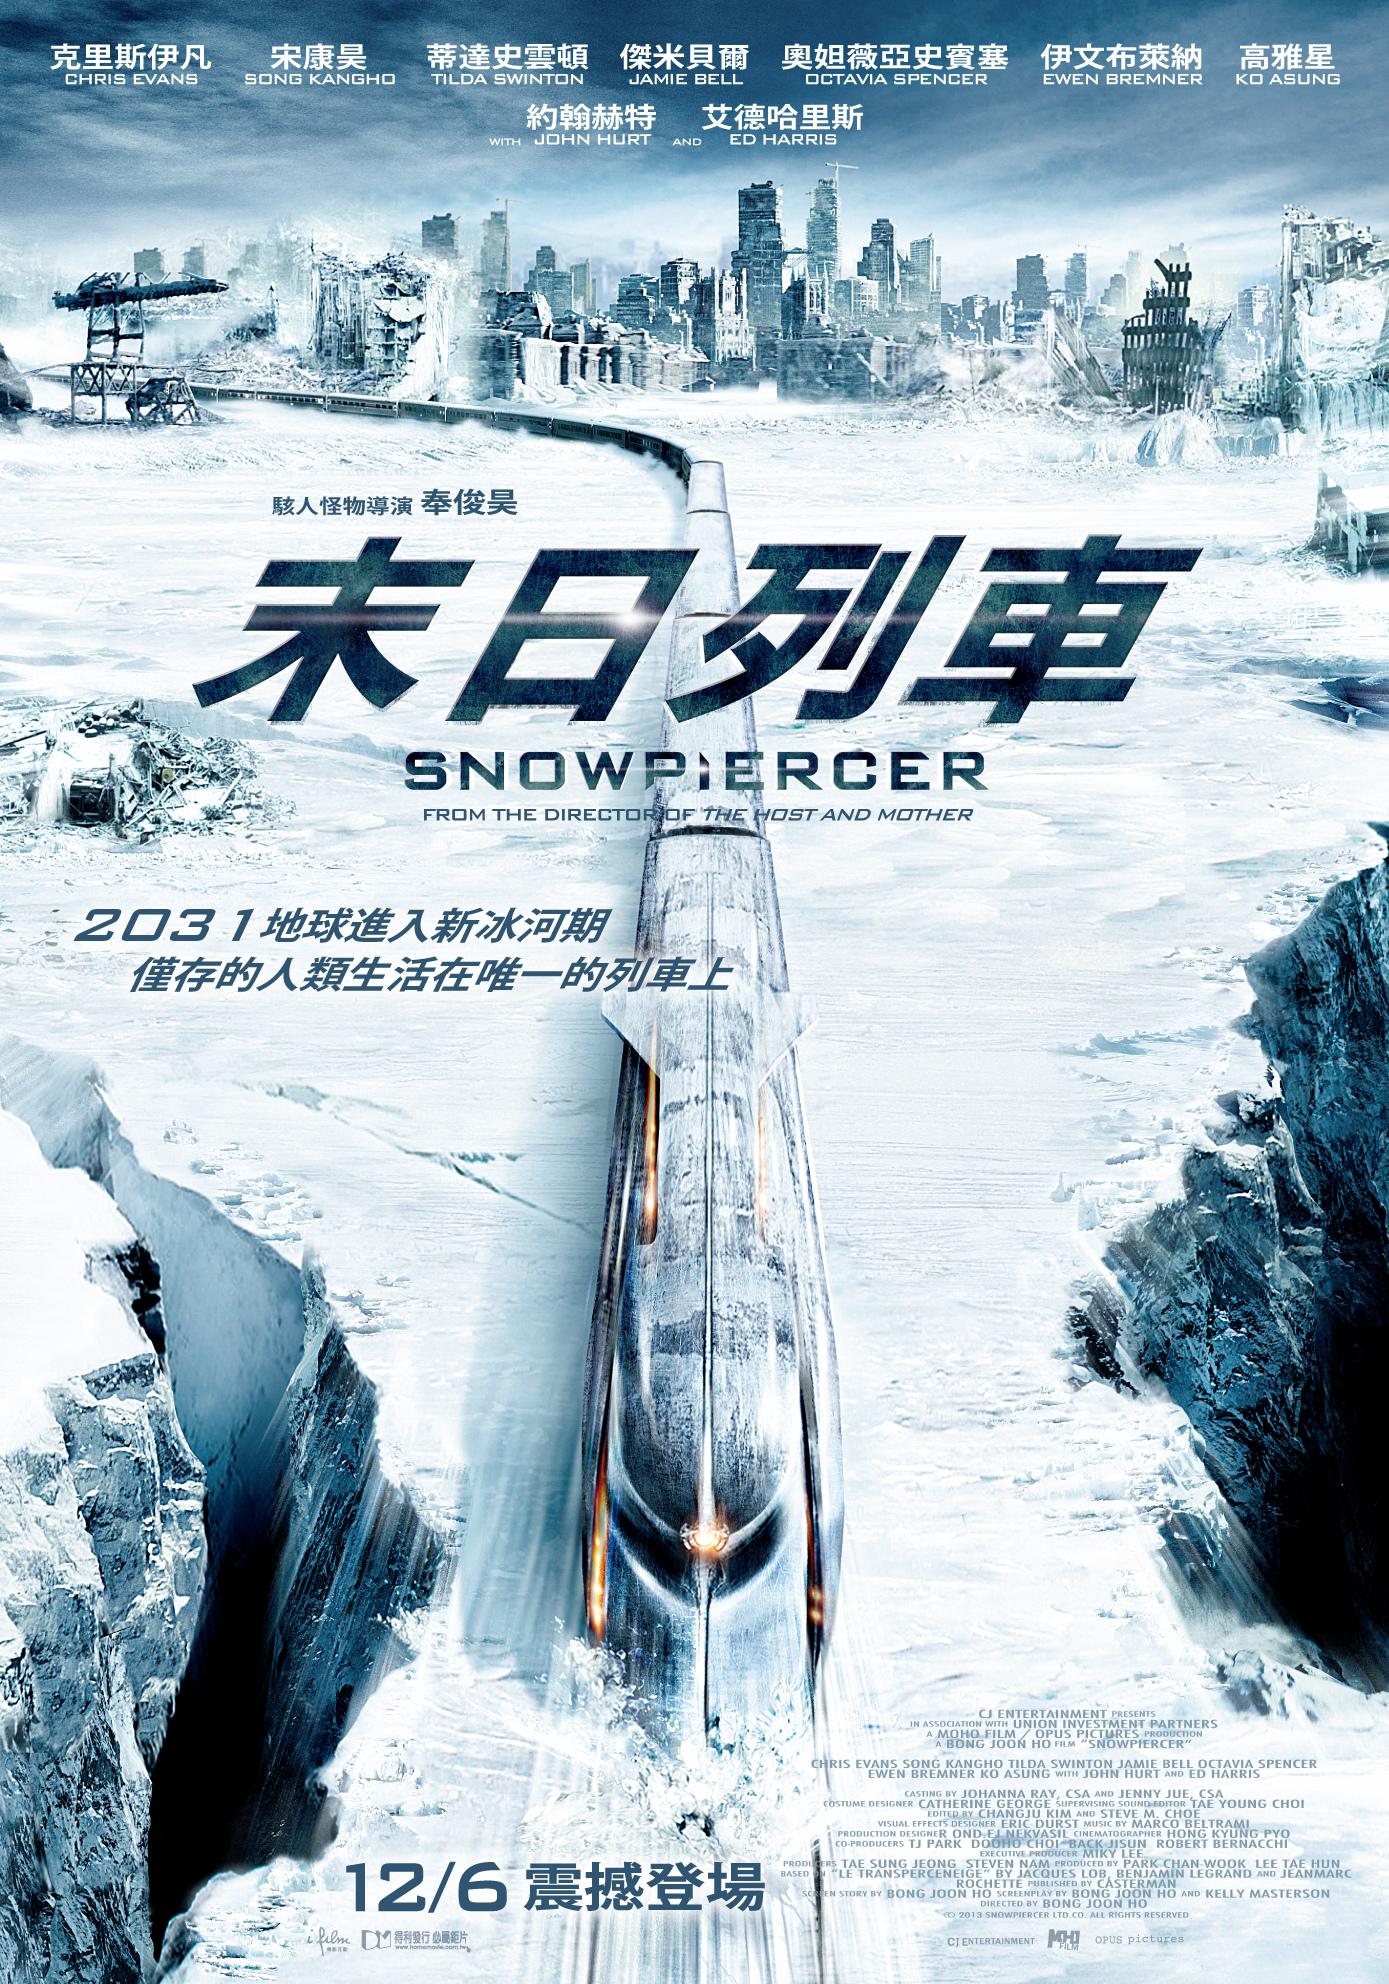 s_poster_100x70cm(送審) (1).jpg